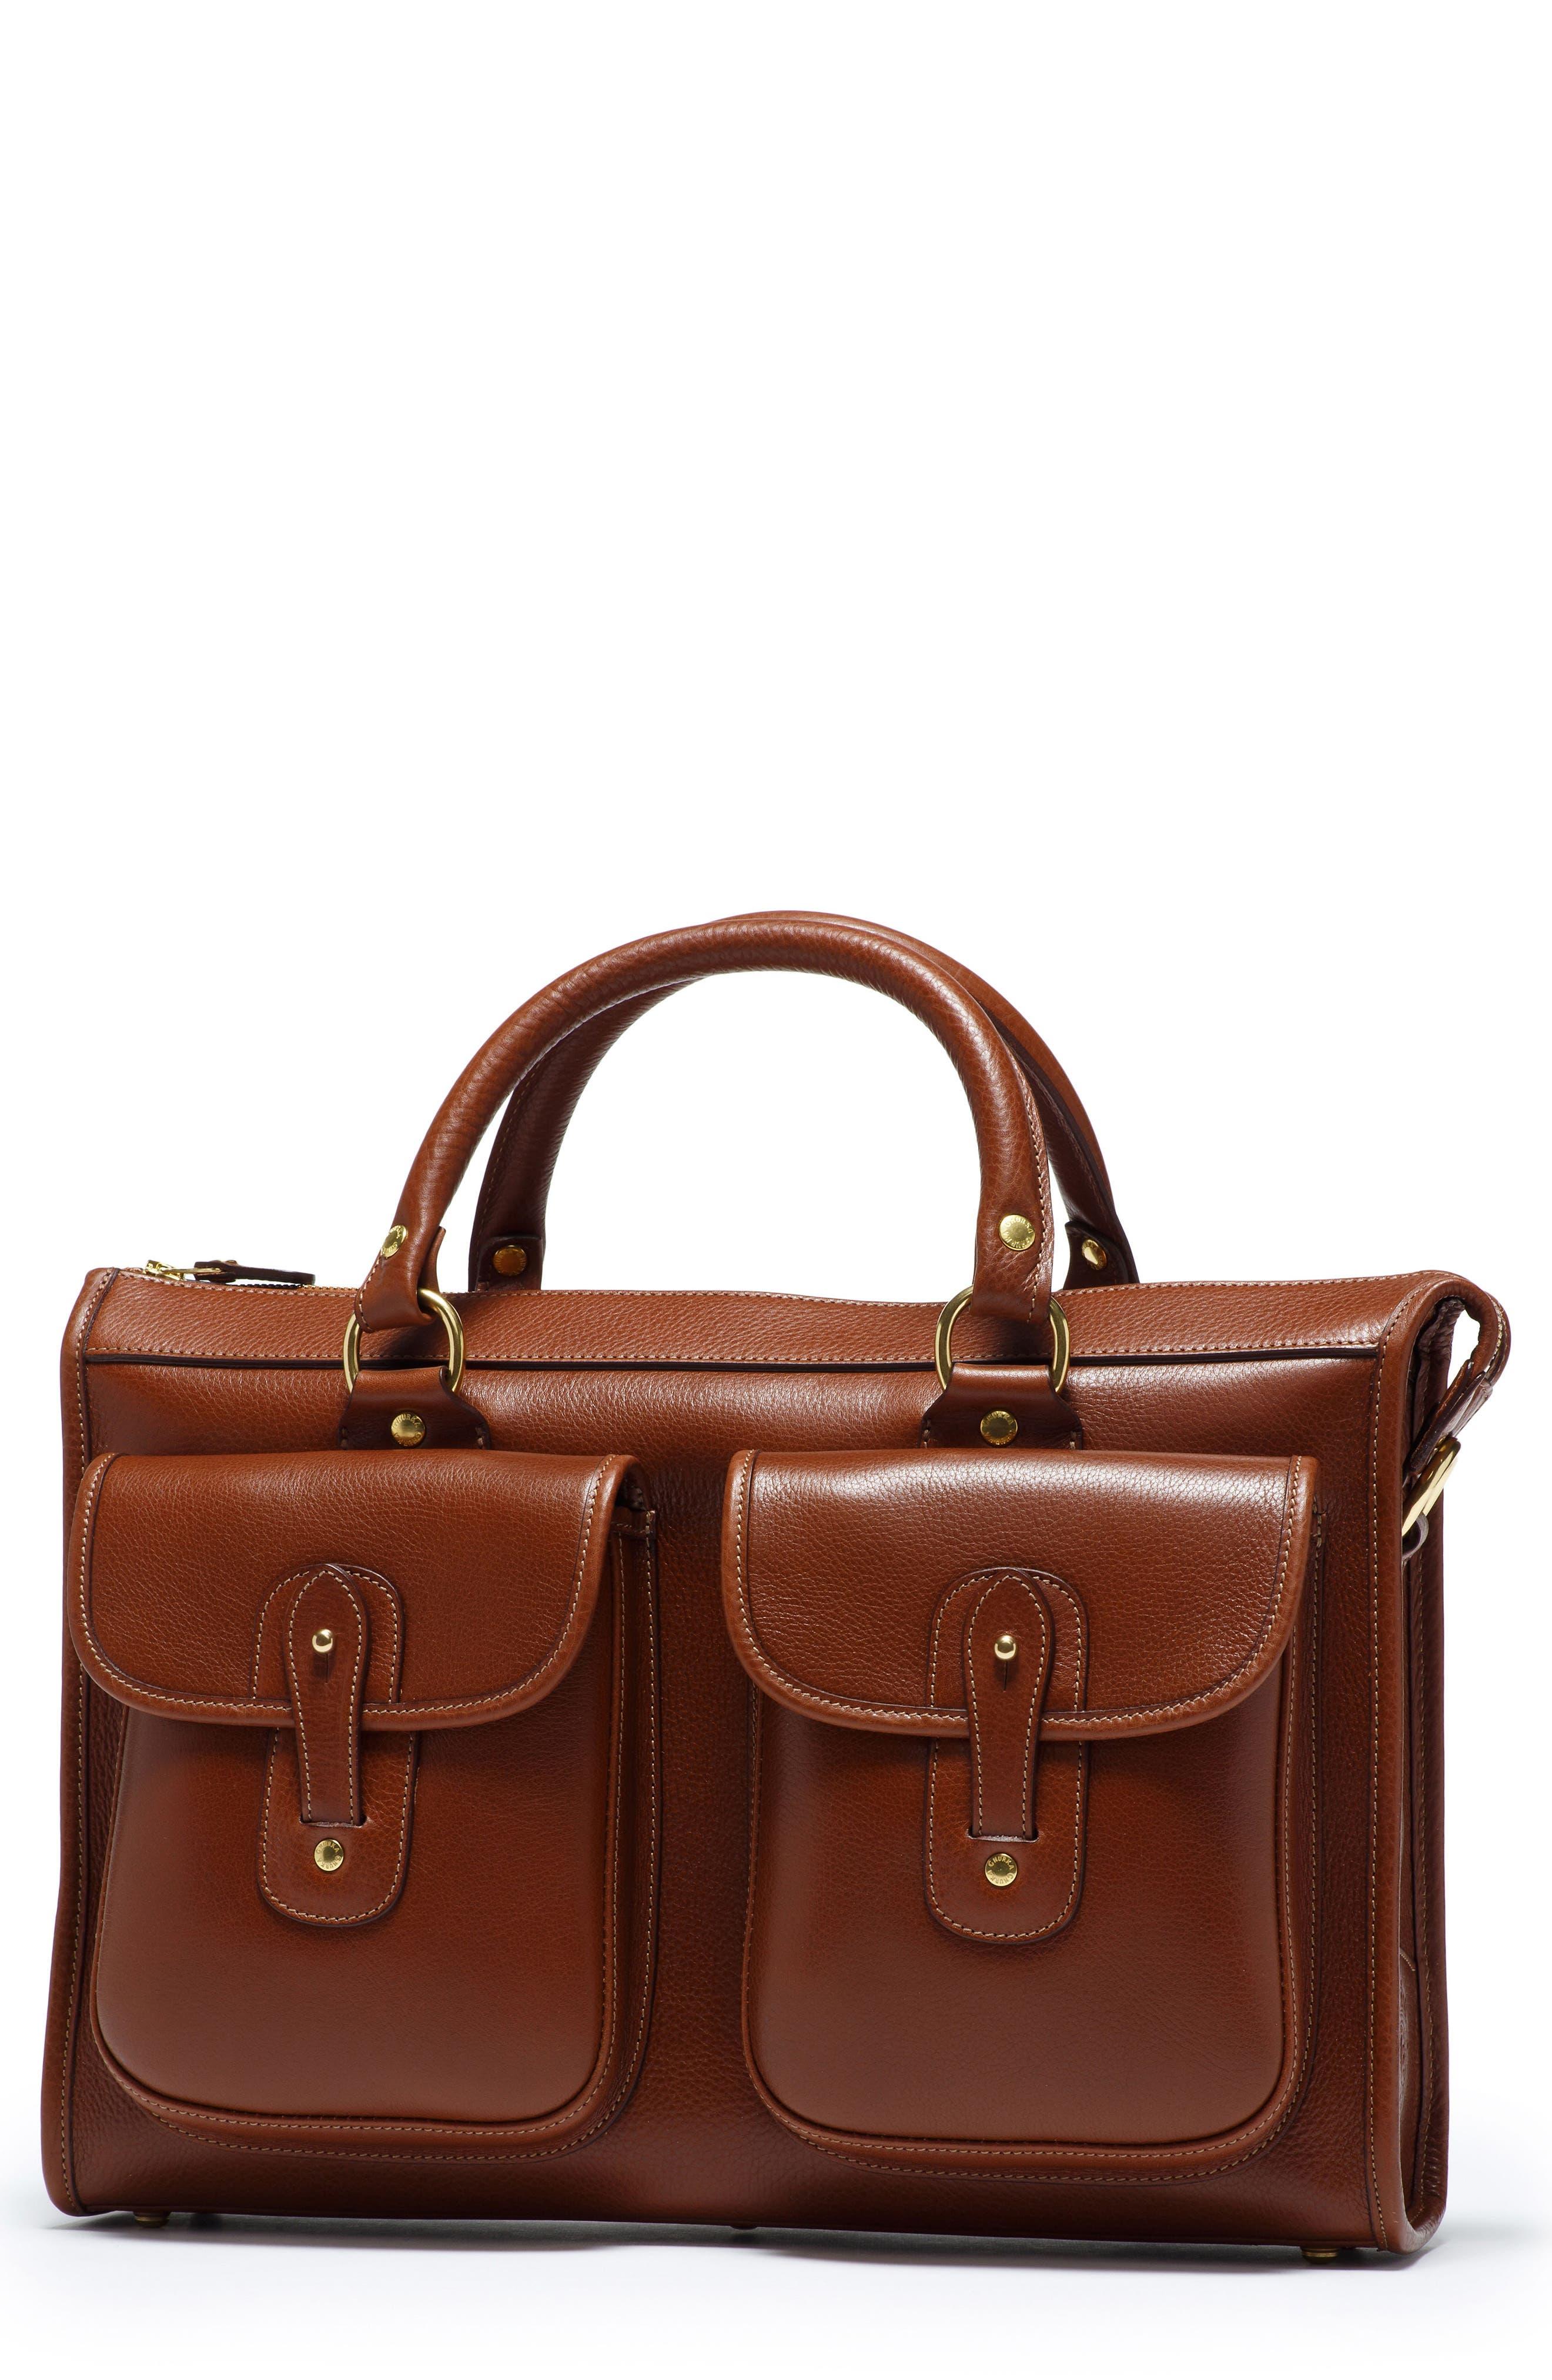 Ghurka 'Examiner' Leather Briefcase